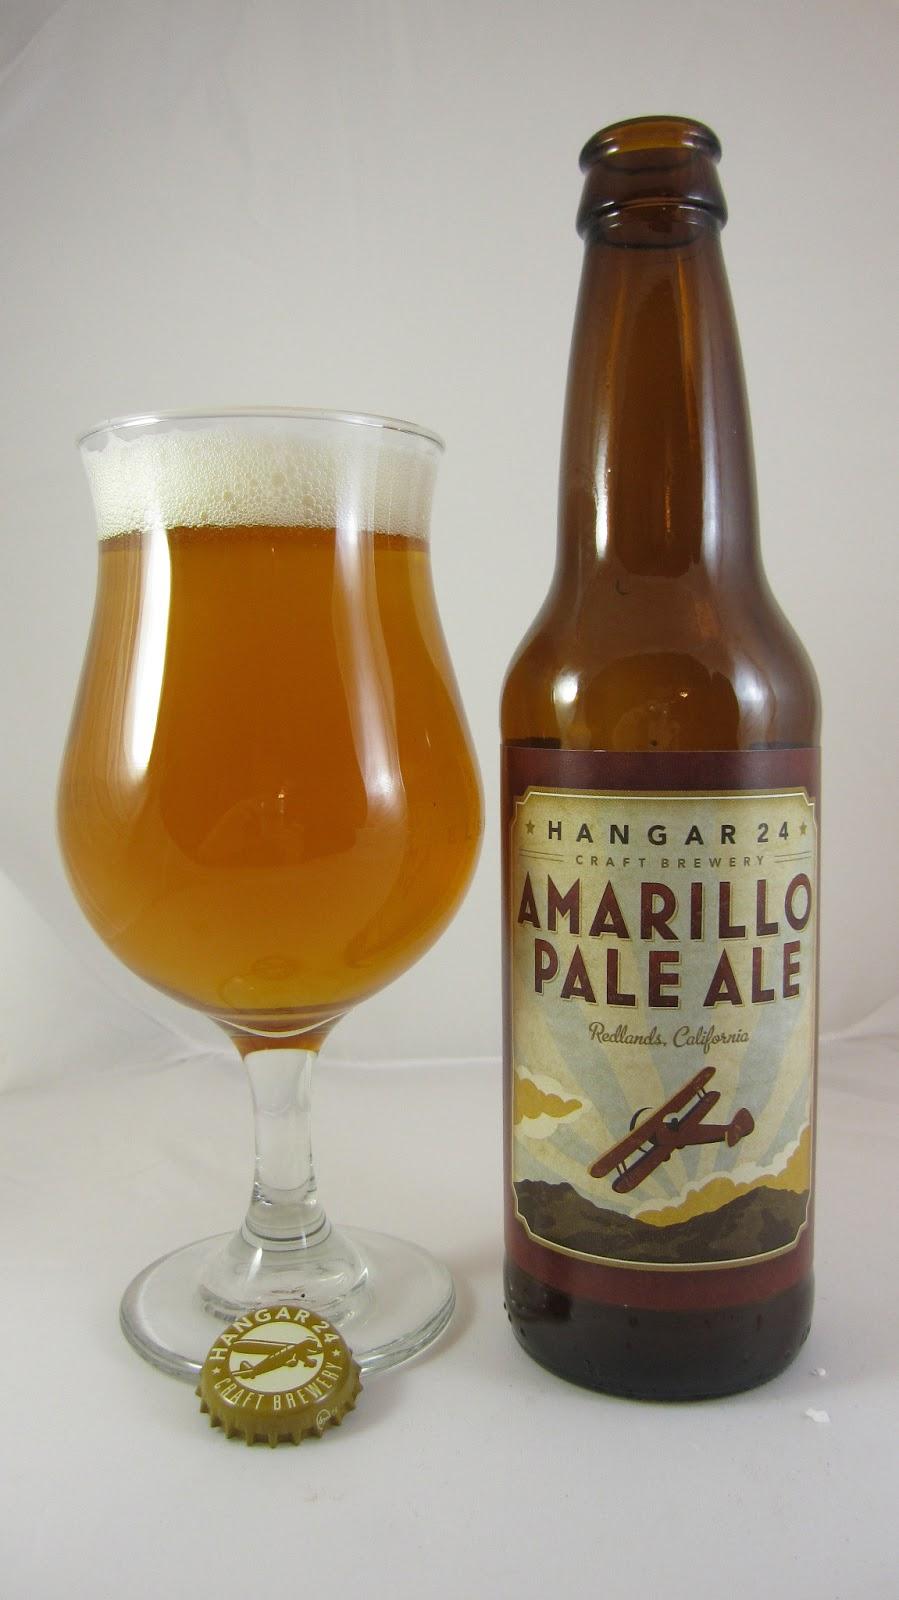 Chad'z Beer Reviews: Hangar 24 Amarillo Pale Ale